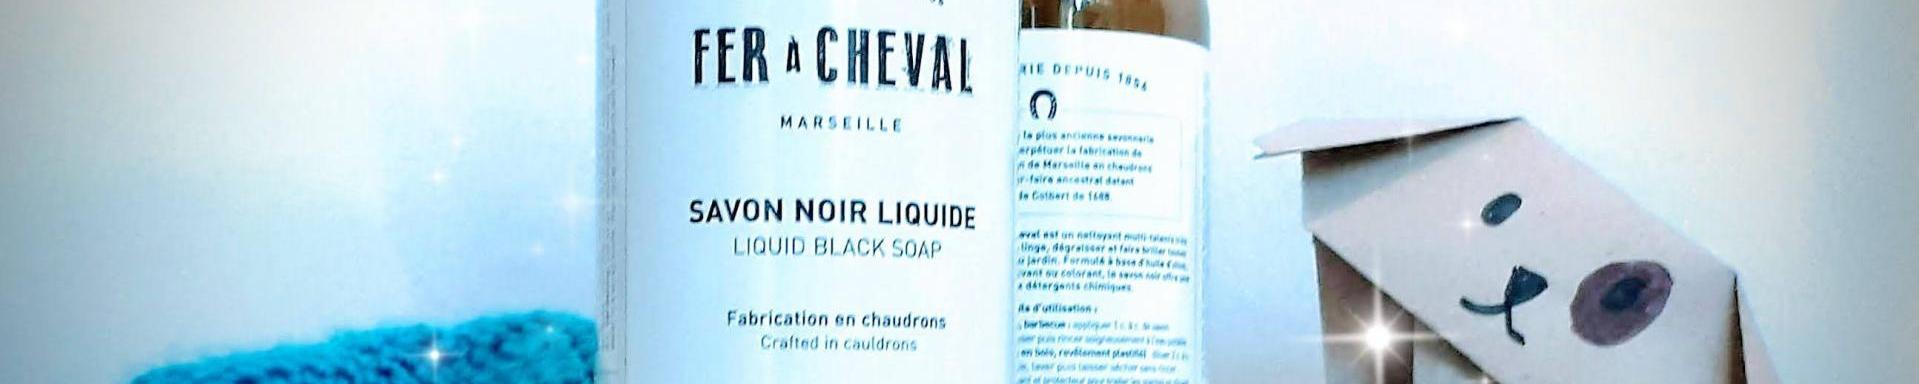 Utilidades del jabón negro Fer À Cheval